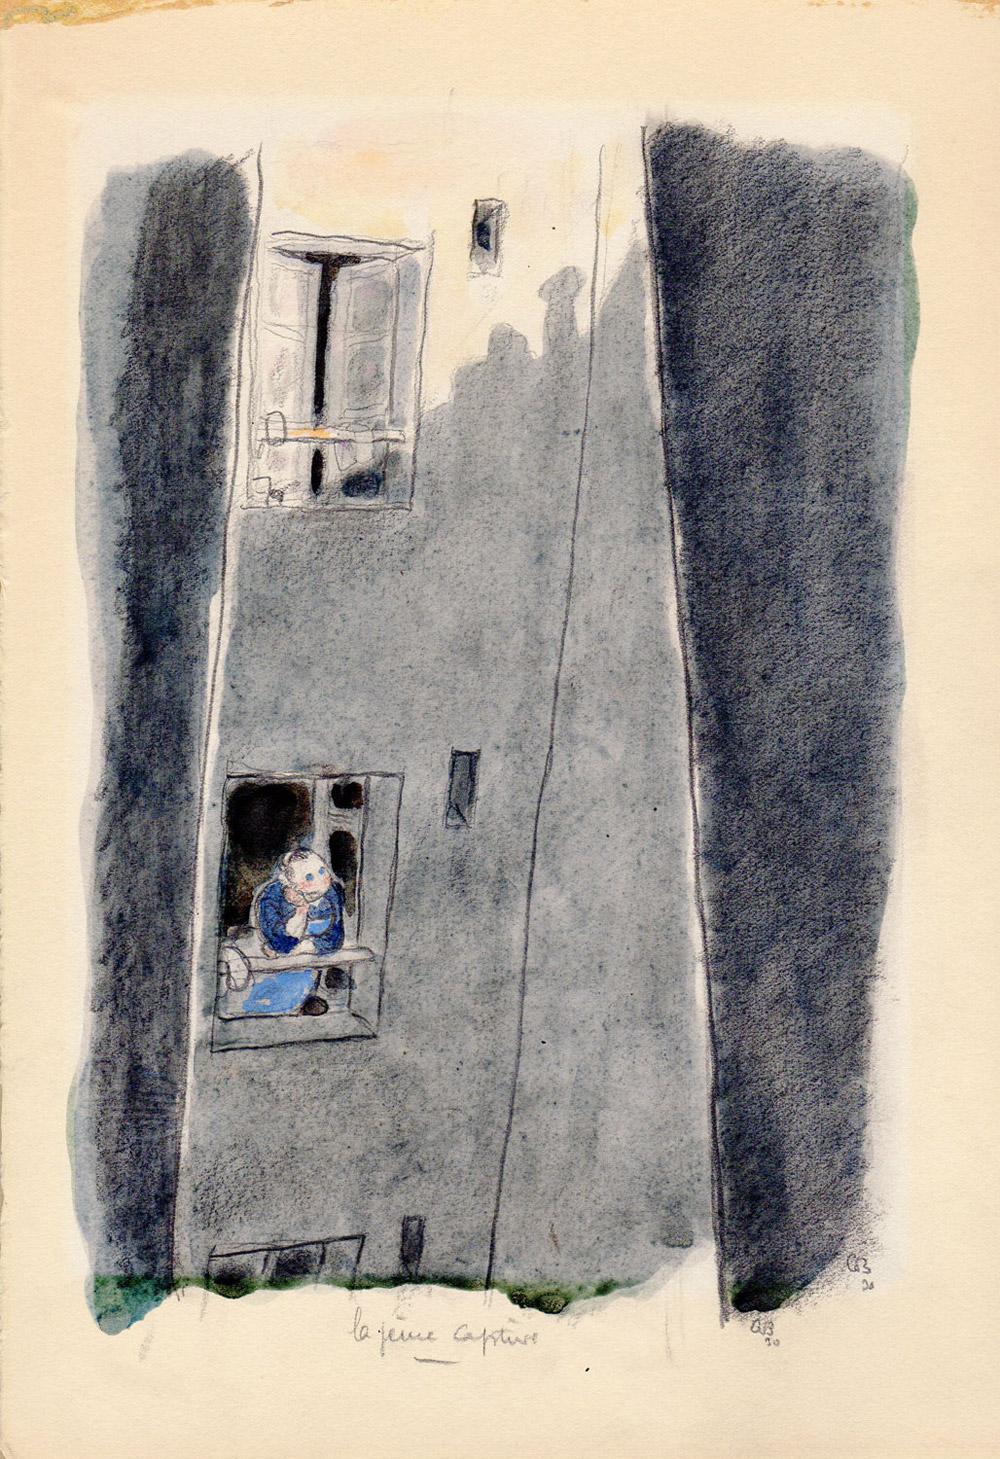 La jeune captive | Gus Bofa | La jeune captive